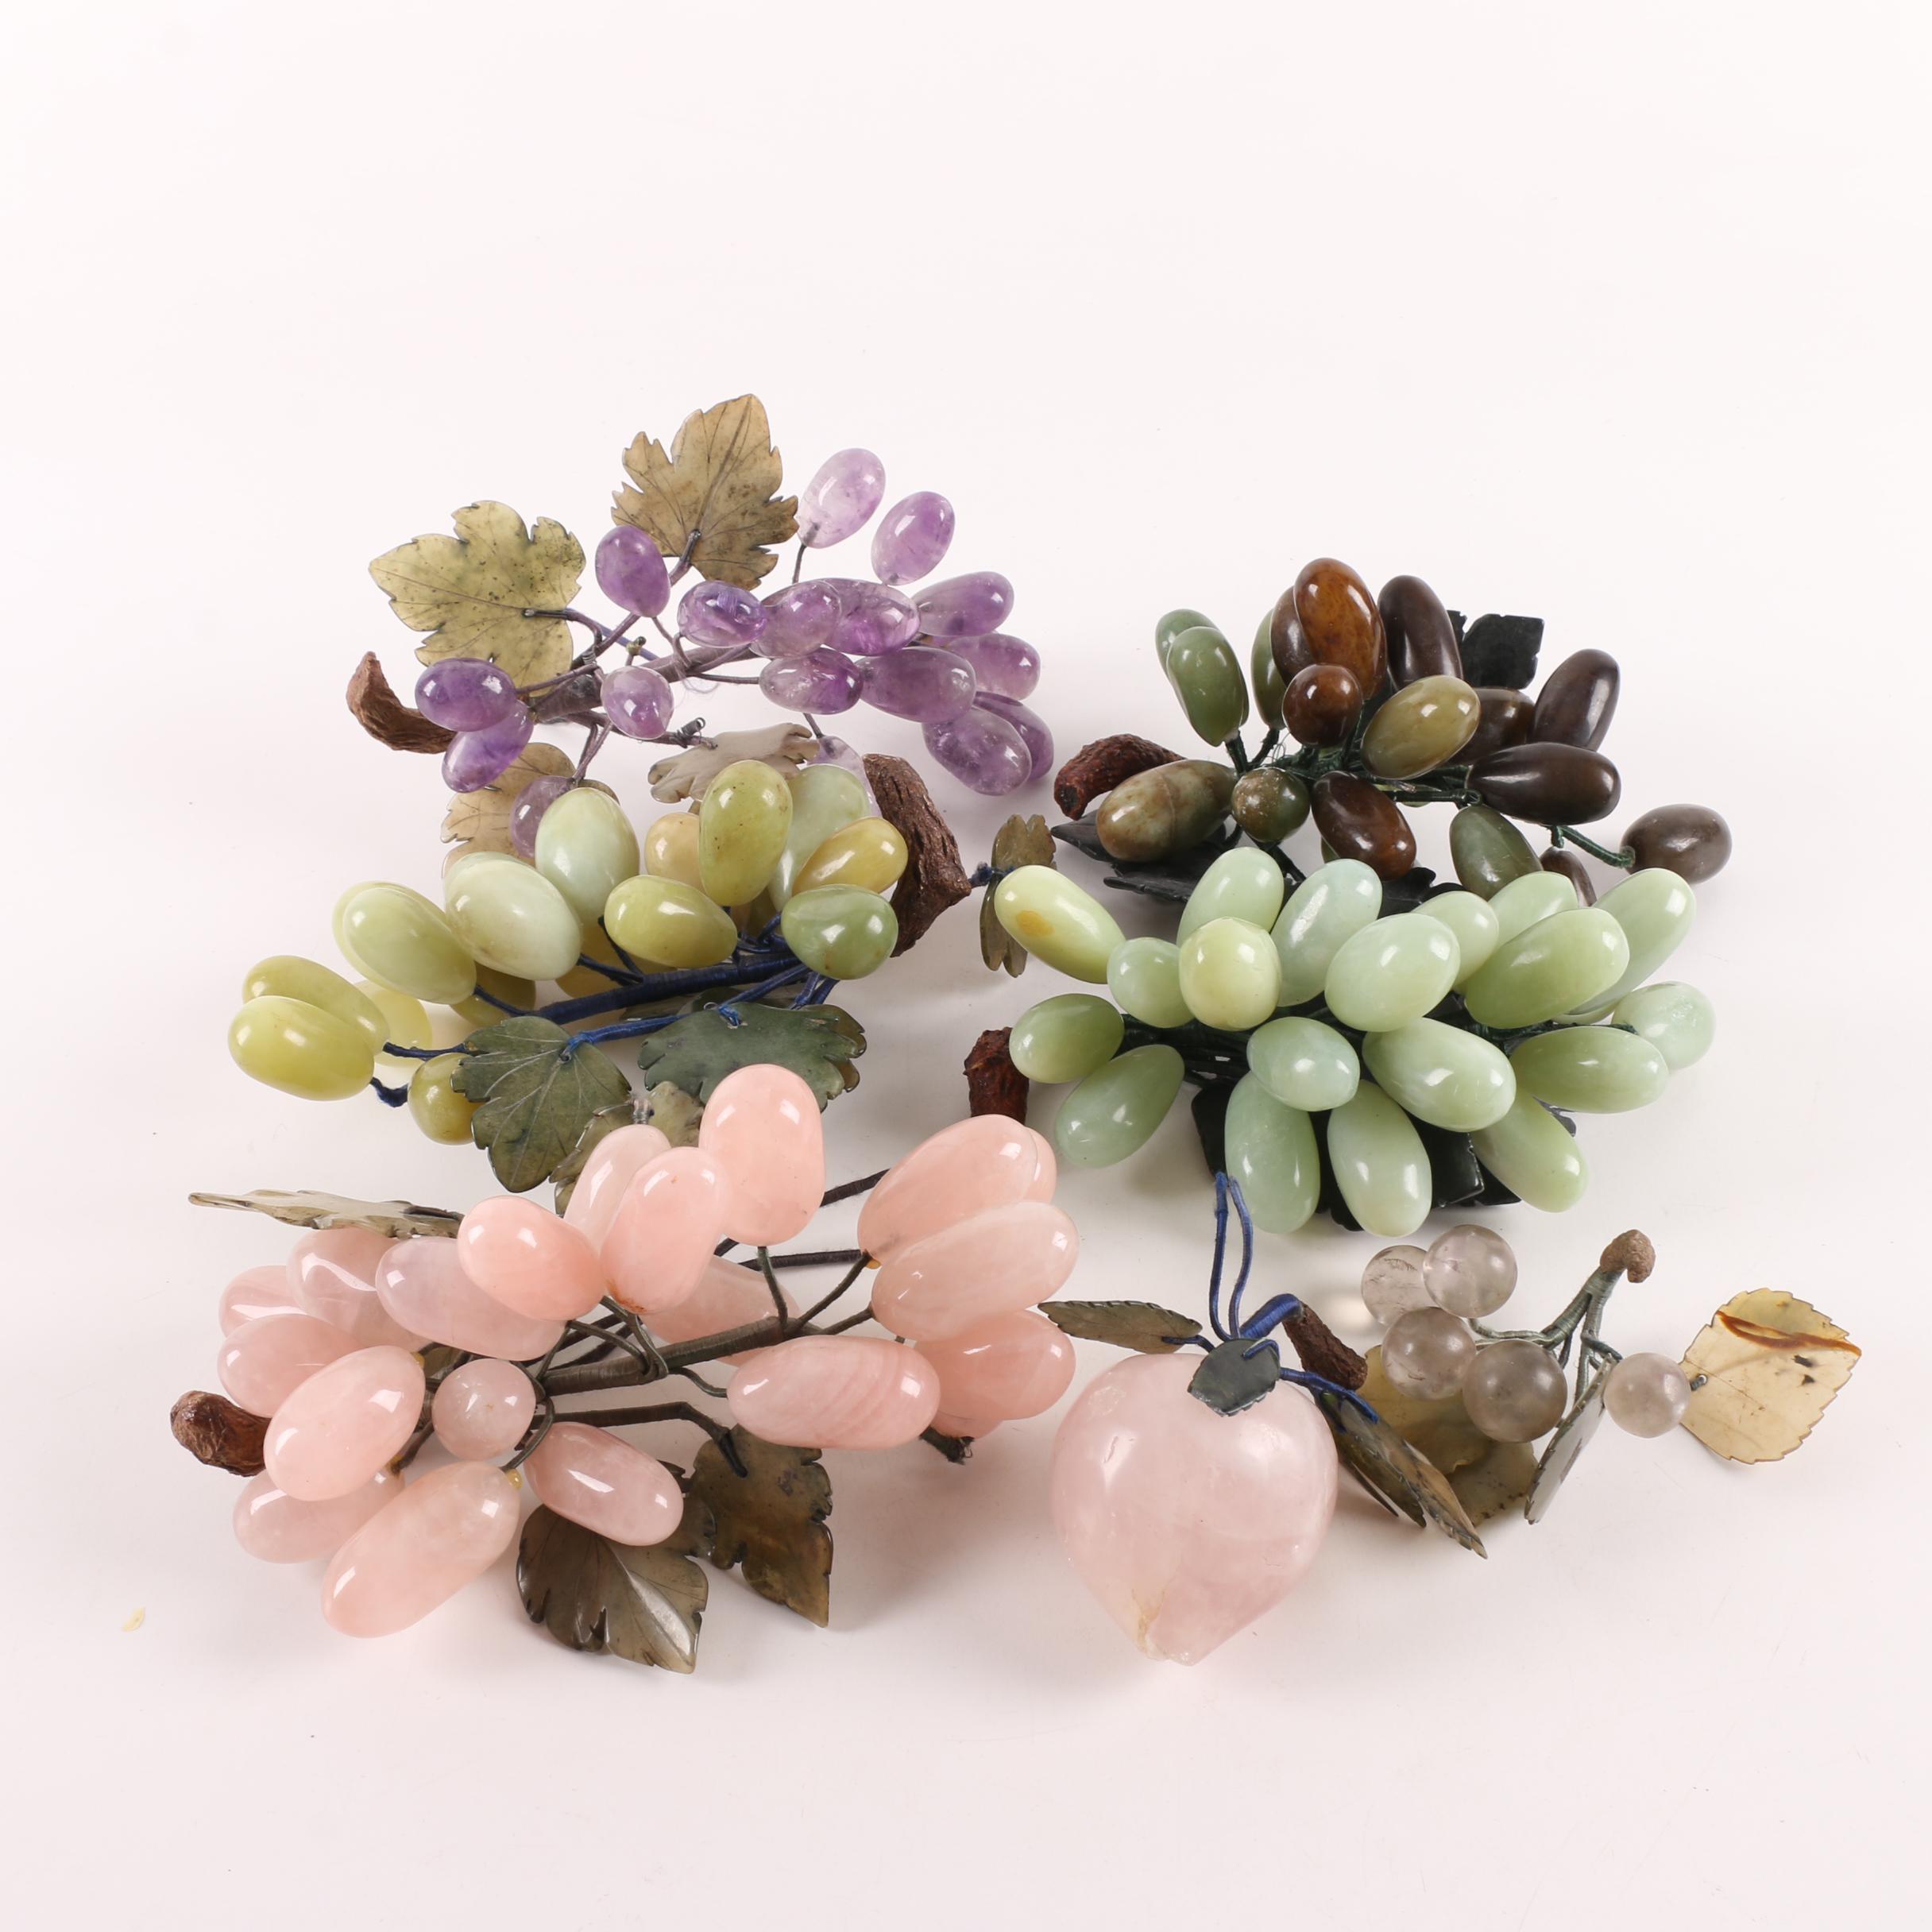 Mineral Fruit